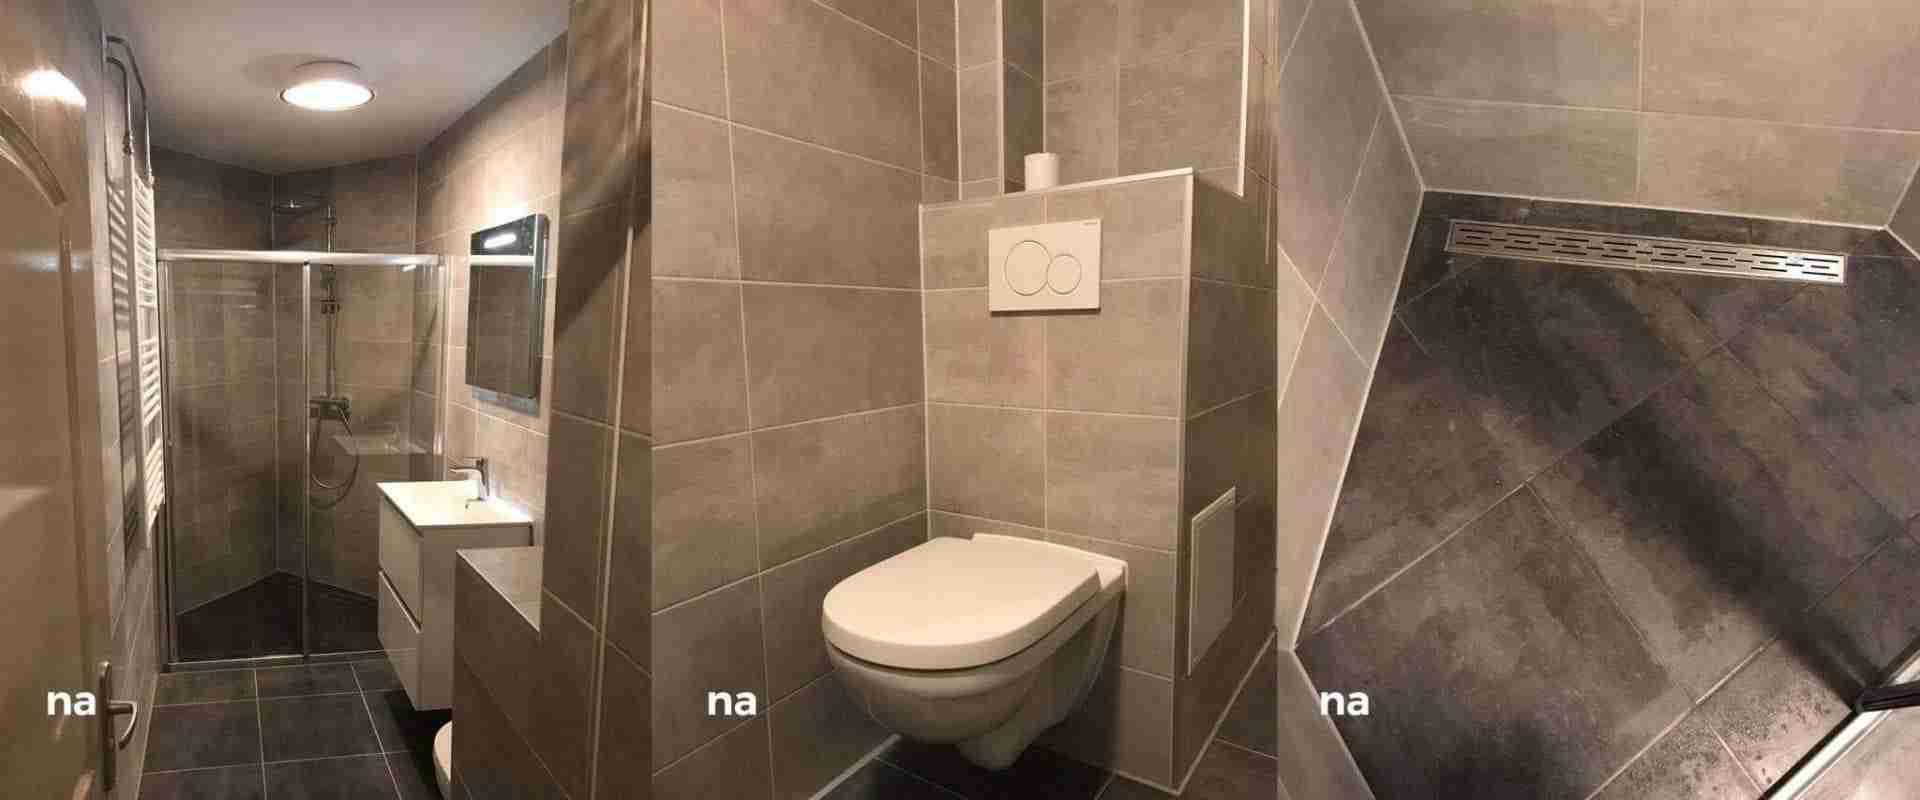 Toilet & Badkamer verbouwing | Installatie Service Amsterdam